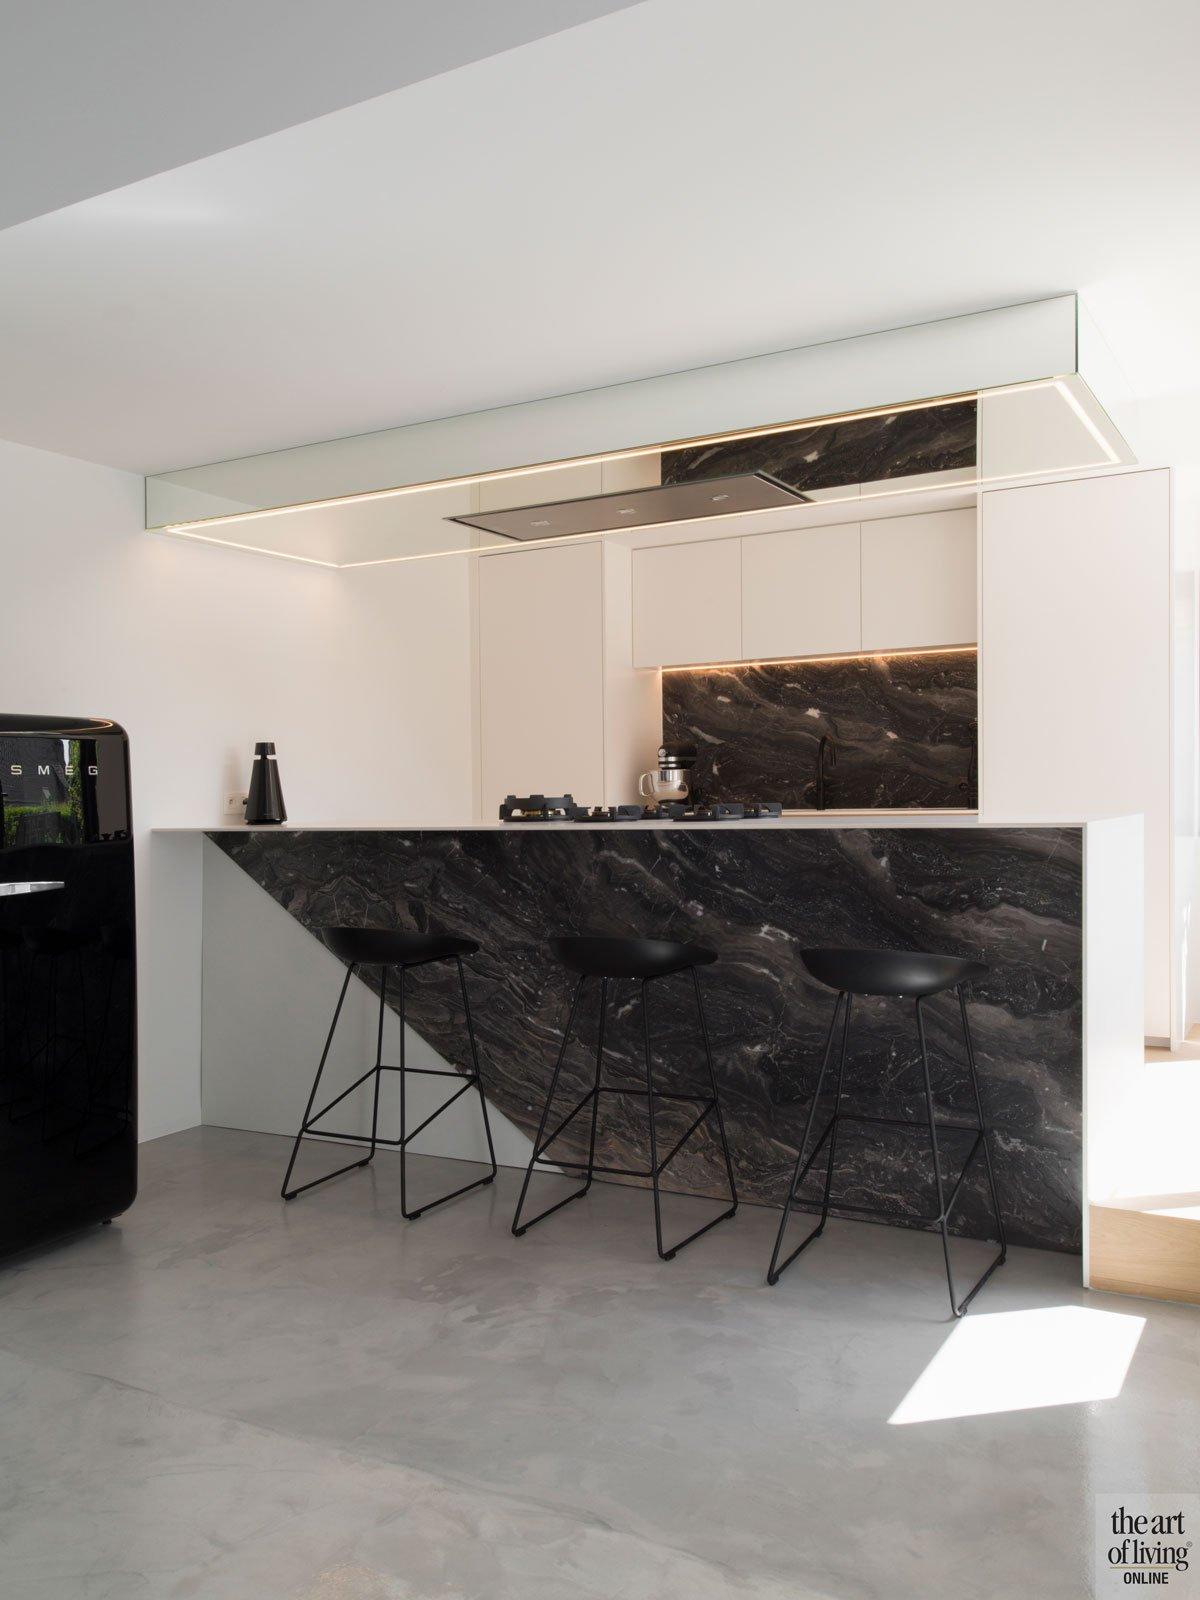 Keuken, Marmer, bovenverdieping, bank, televisie, The Art of Living Online